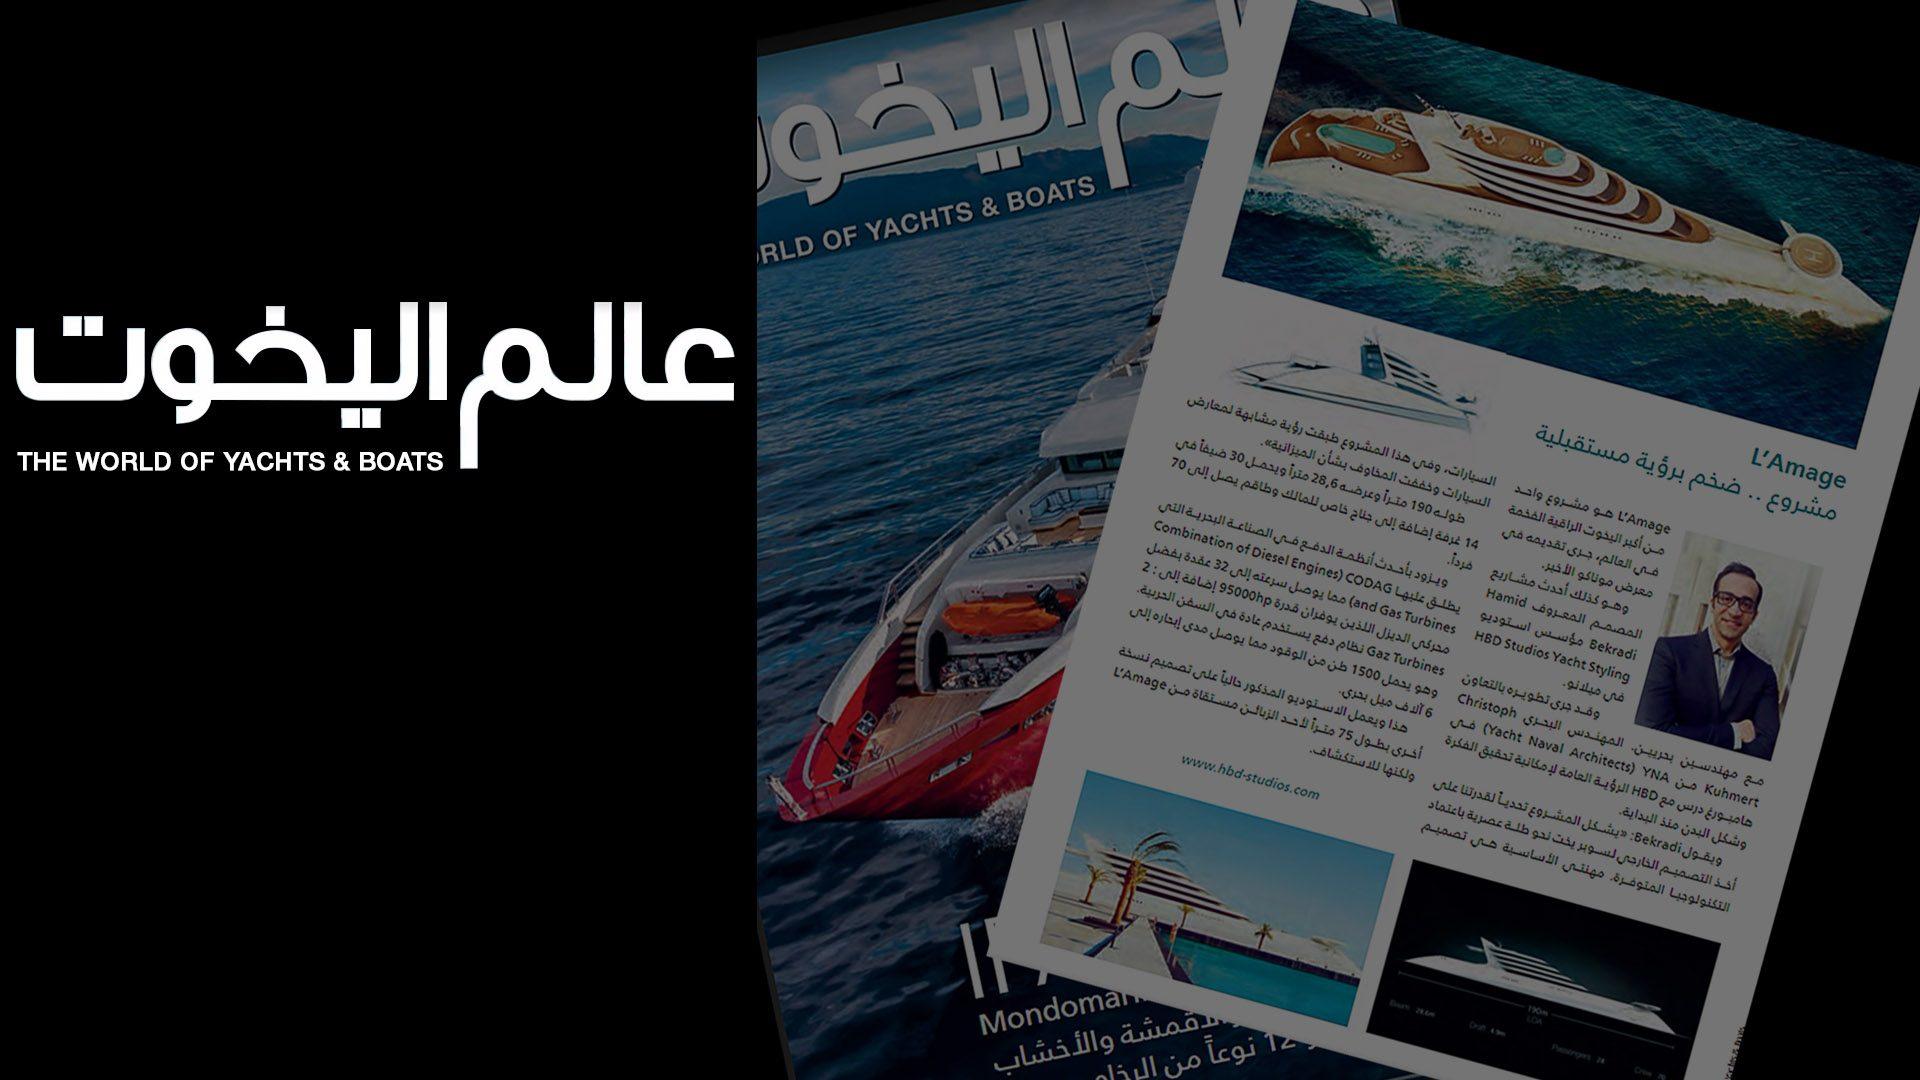 The World of Yachts & Boas magazine article about Hamid Bekradi design for Superyacht L'Amage